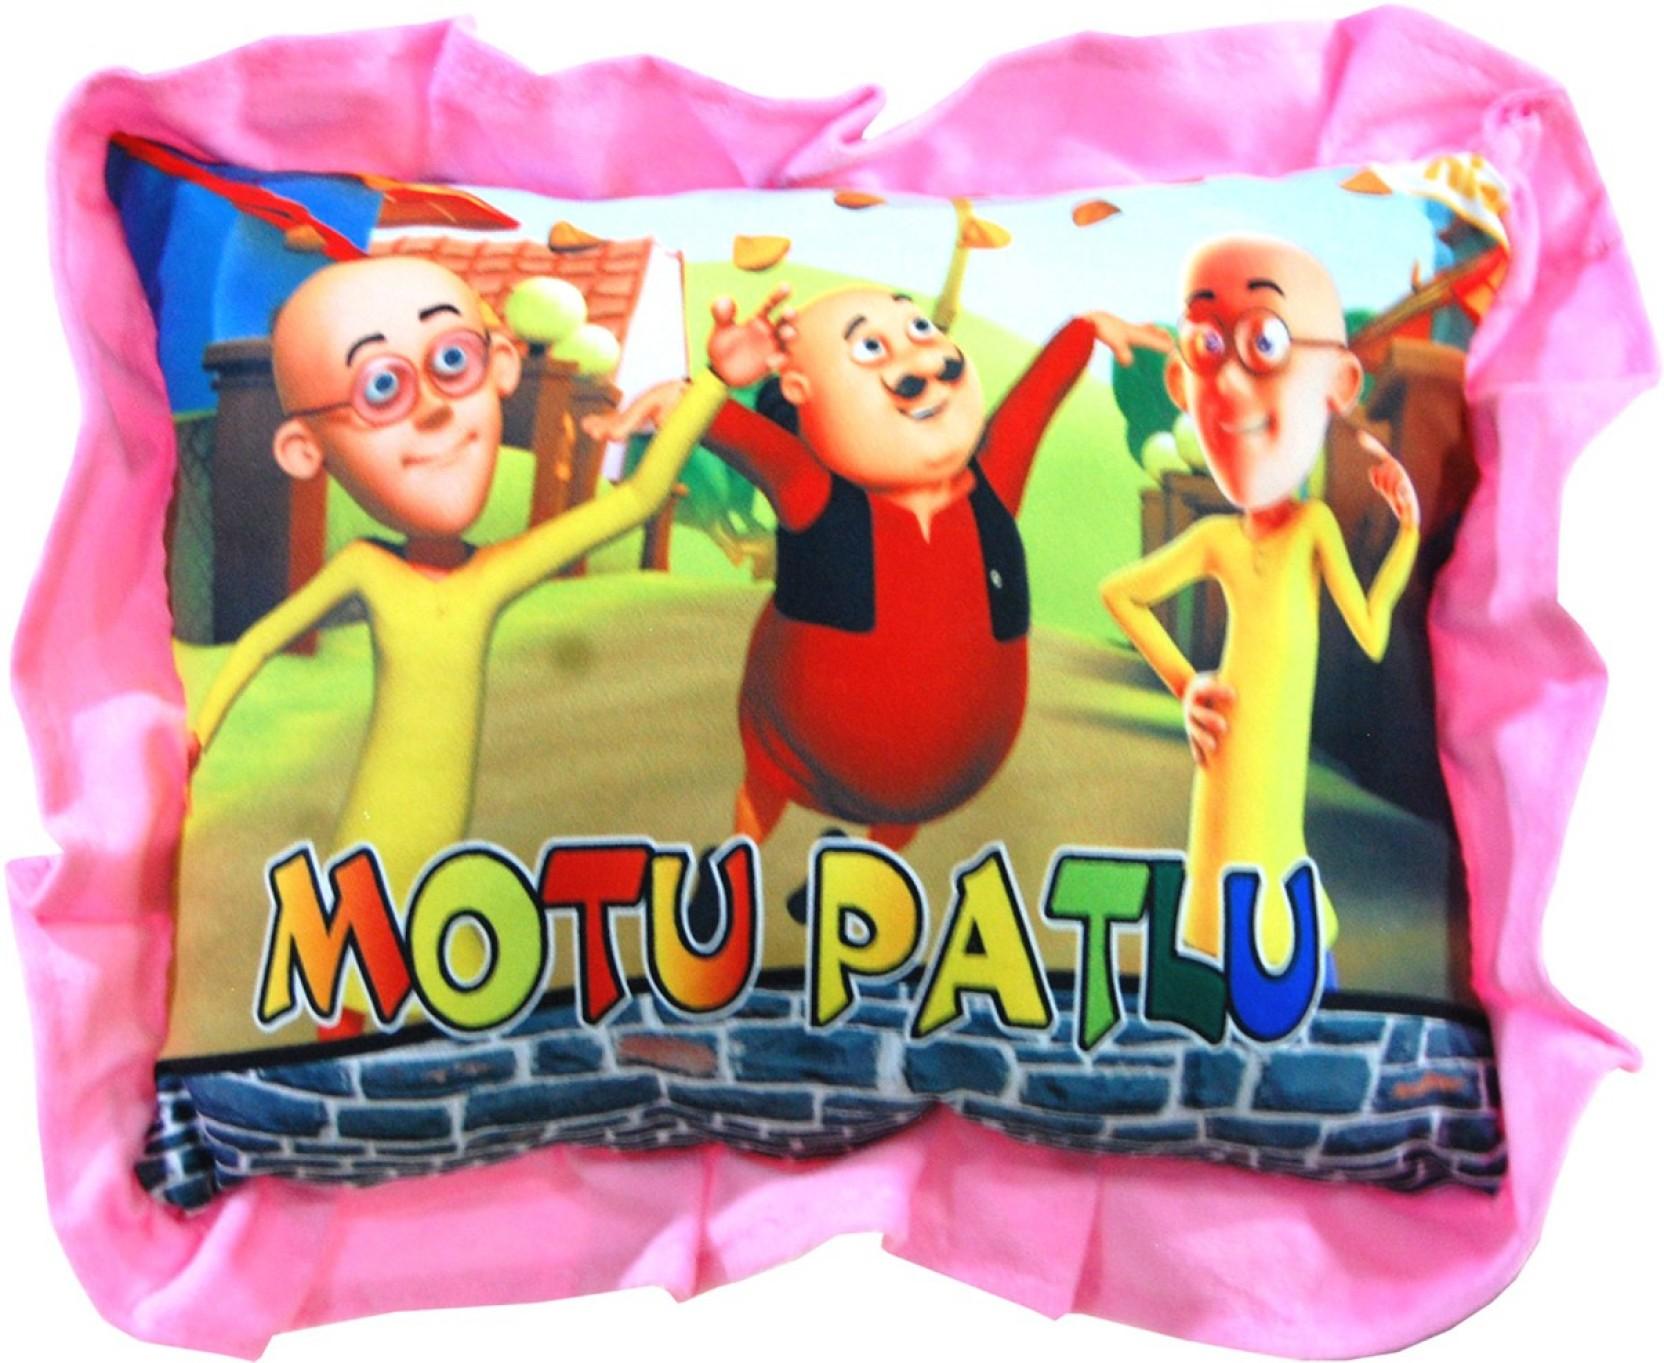 Vinr Motu Patlu Pillow Shaped Soft Toy 26 Cm Motu Patlu Pillow